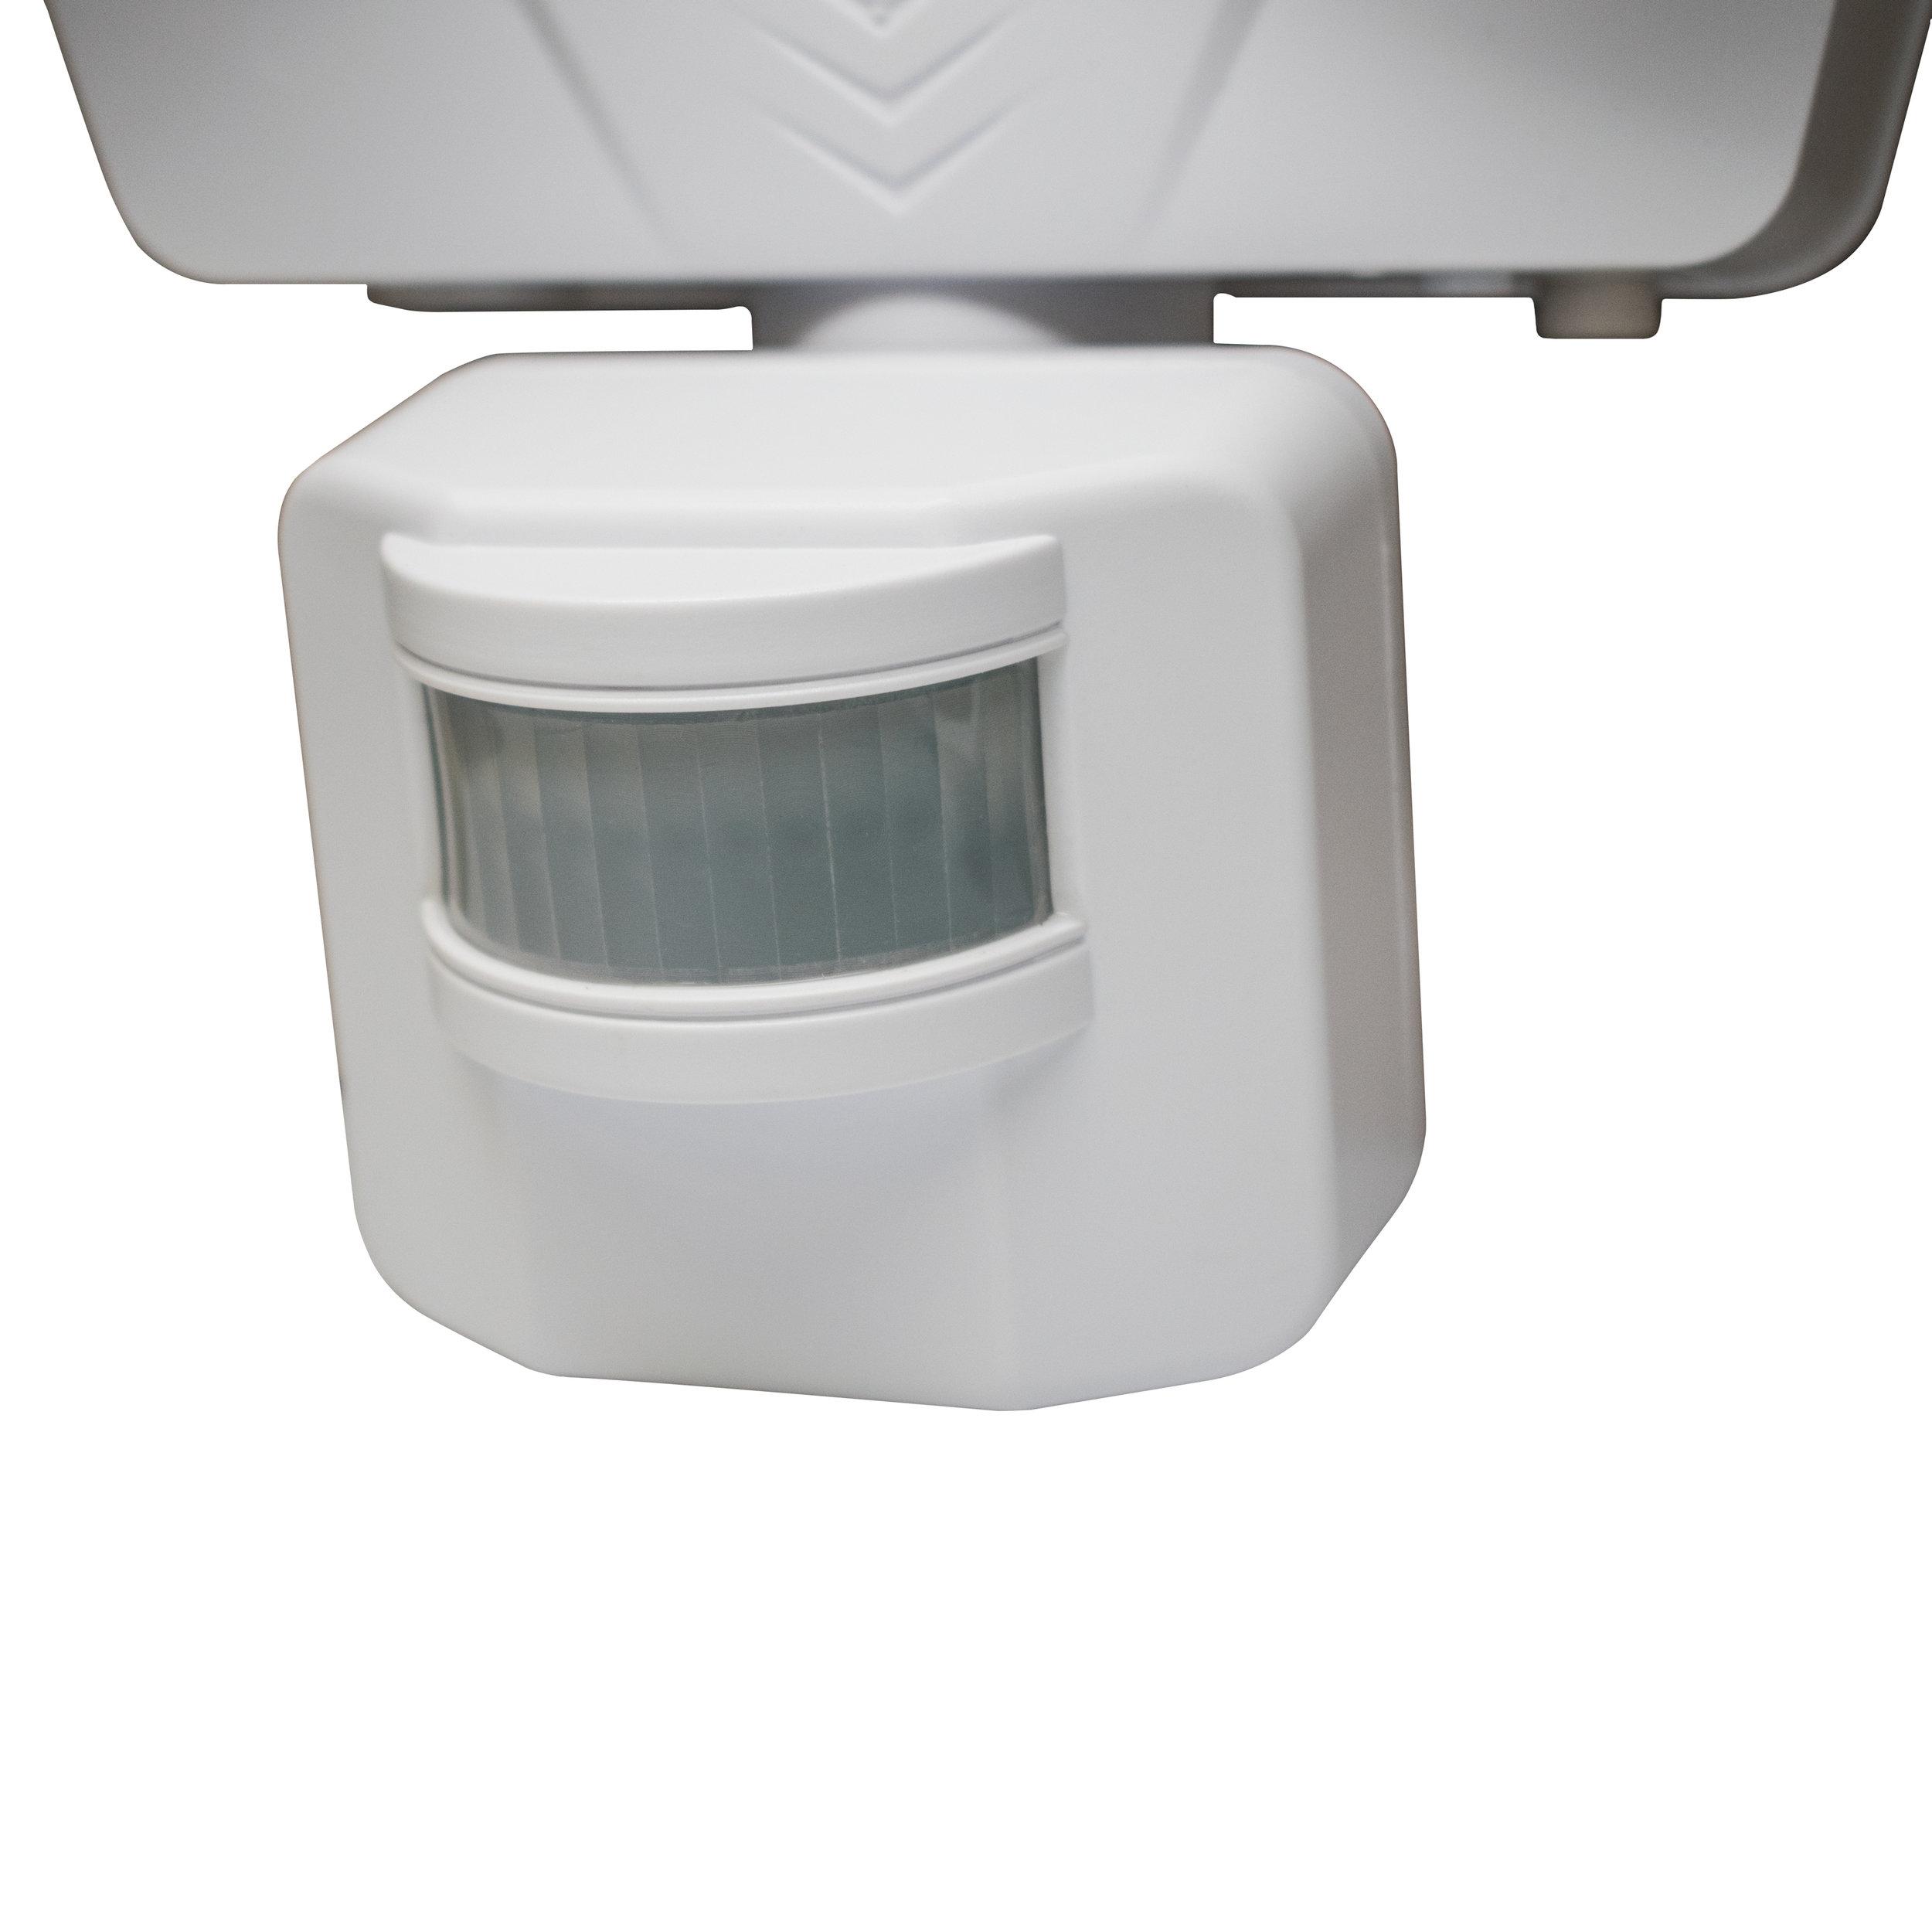 Novolink NL-DSW1 Solar Security Light, Sensor Detail